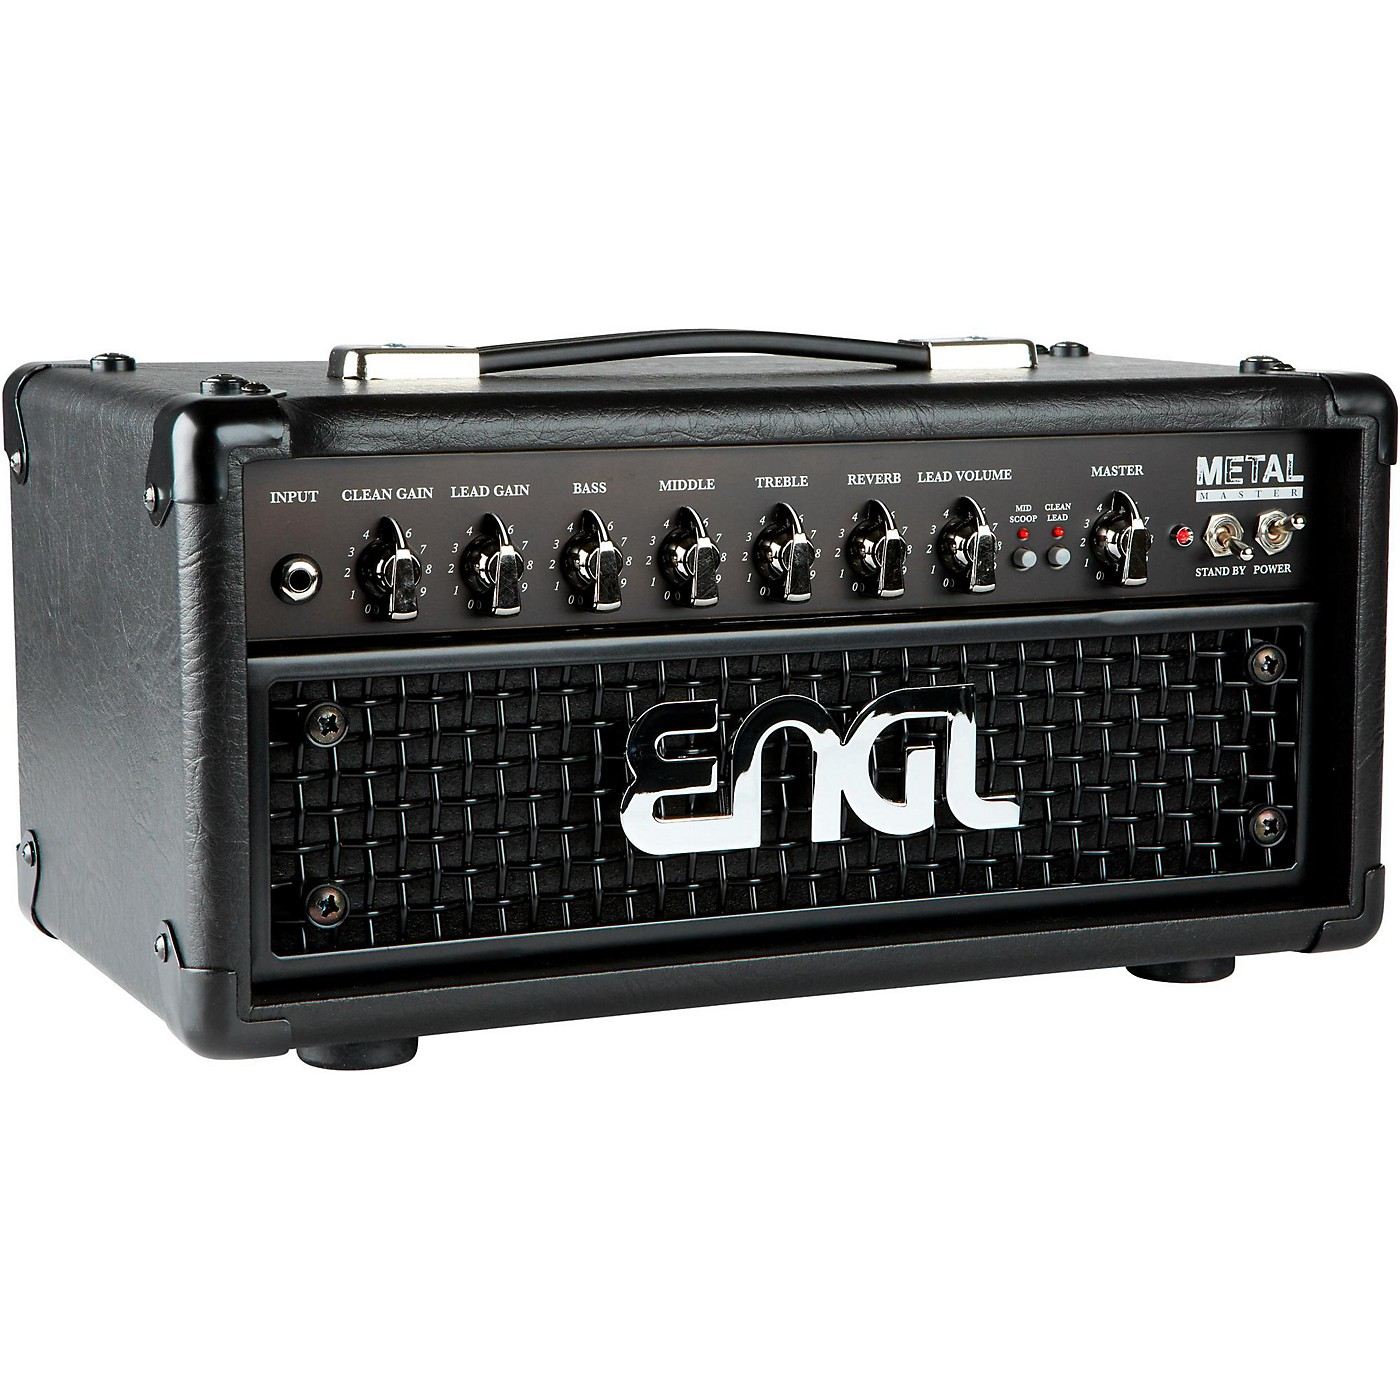 Engl MetalMaster 20W Tube Guitar Amp Head with Reverb thumbnail